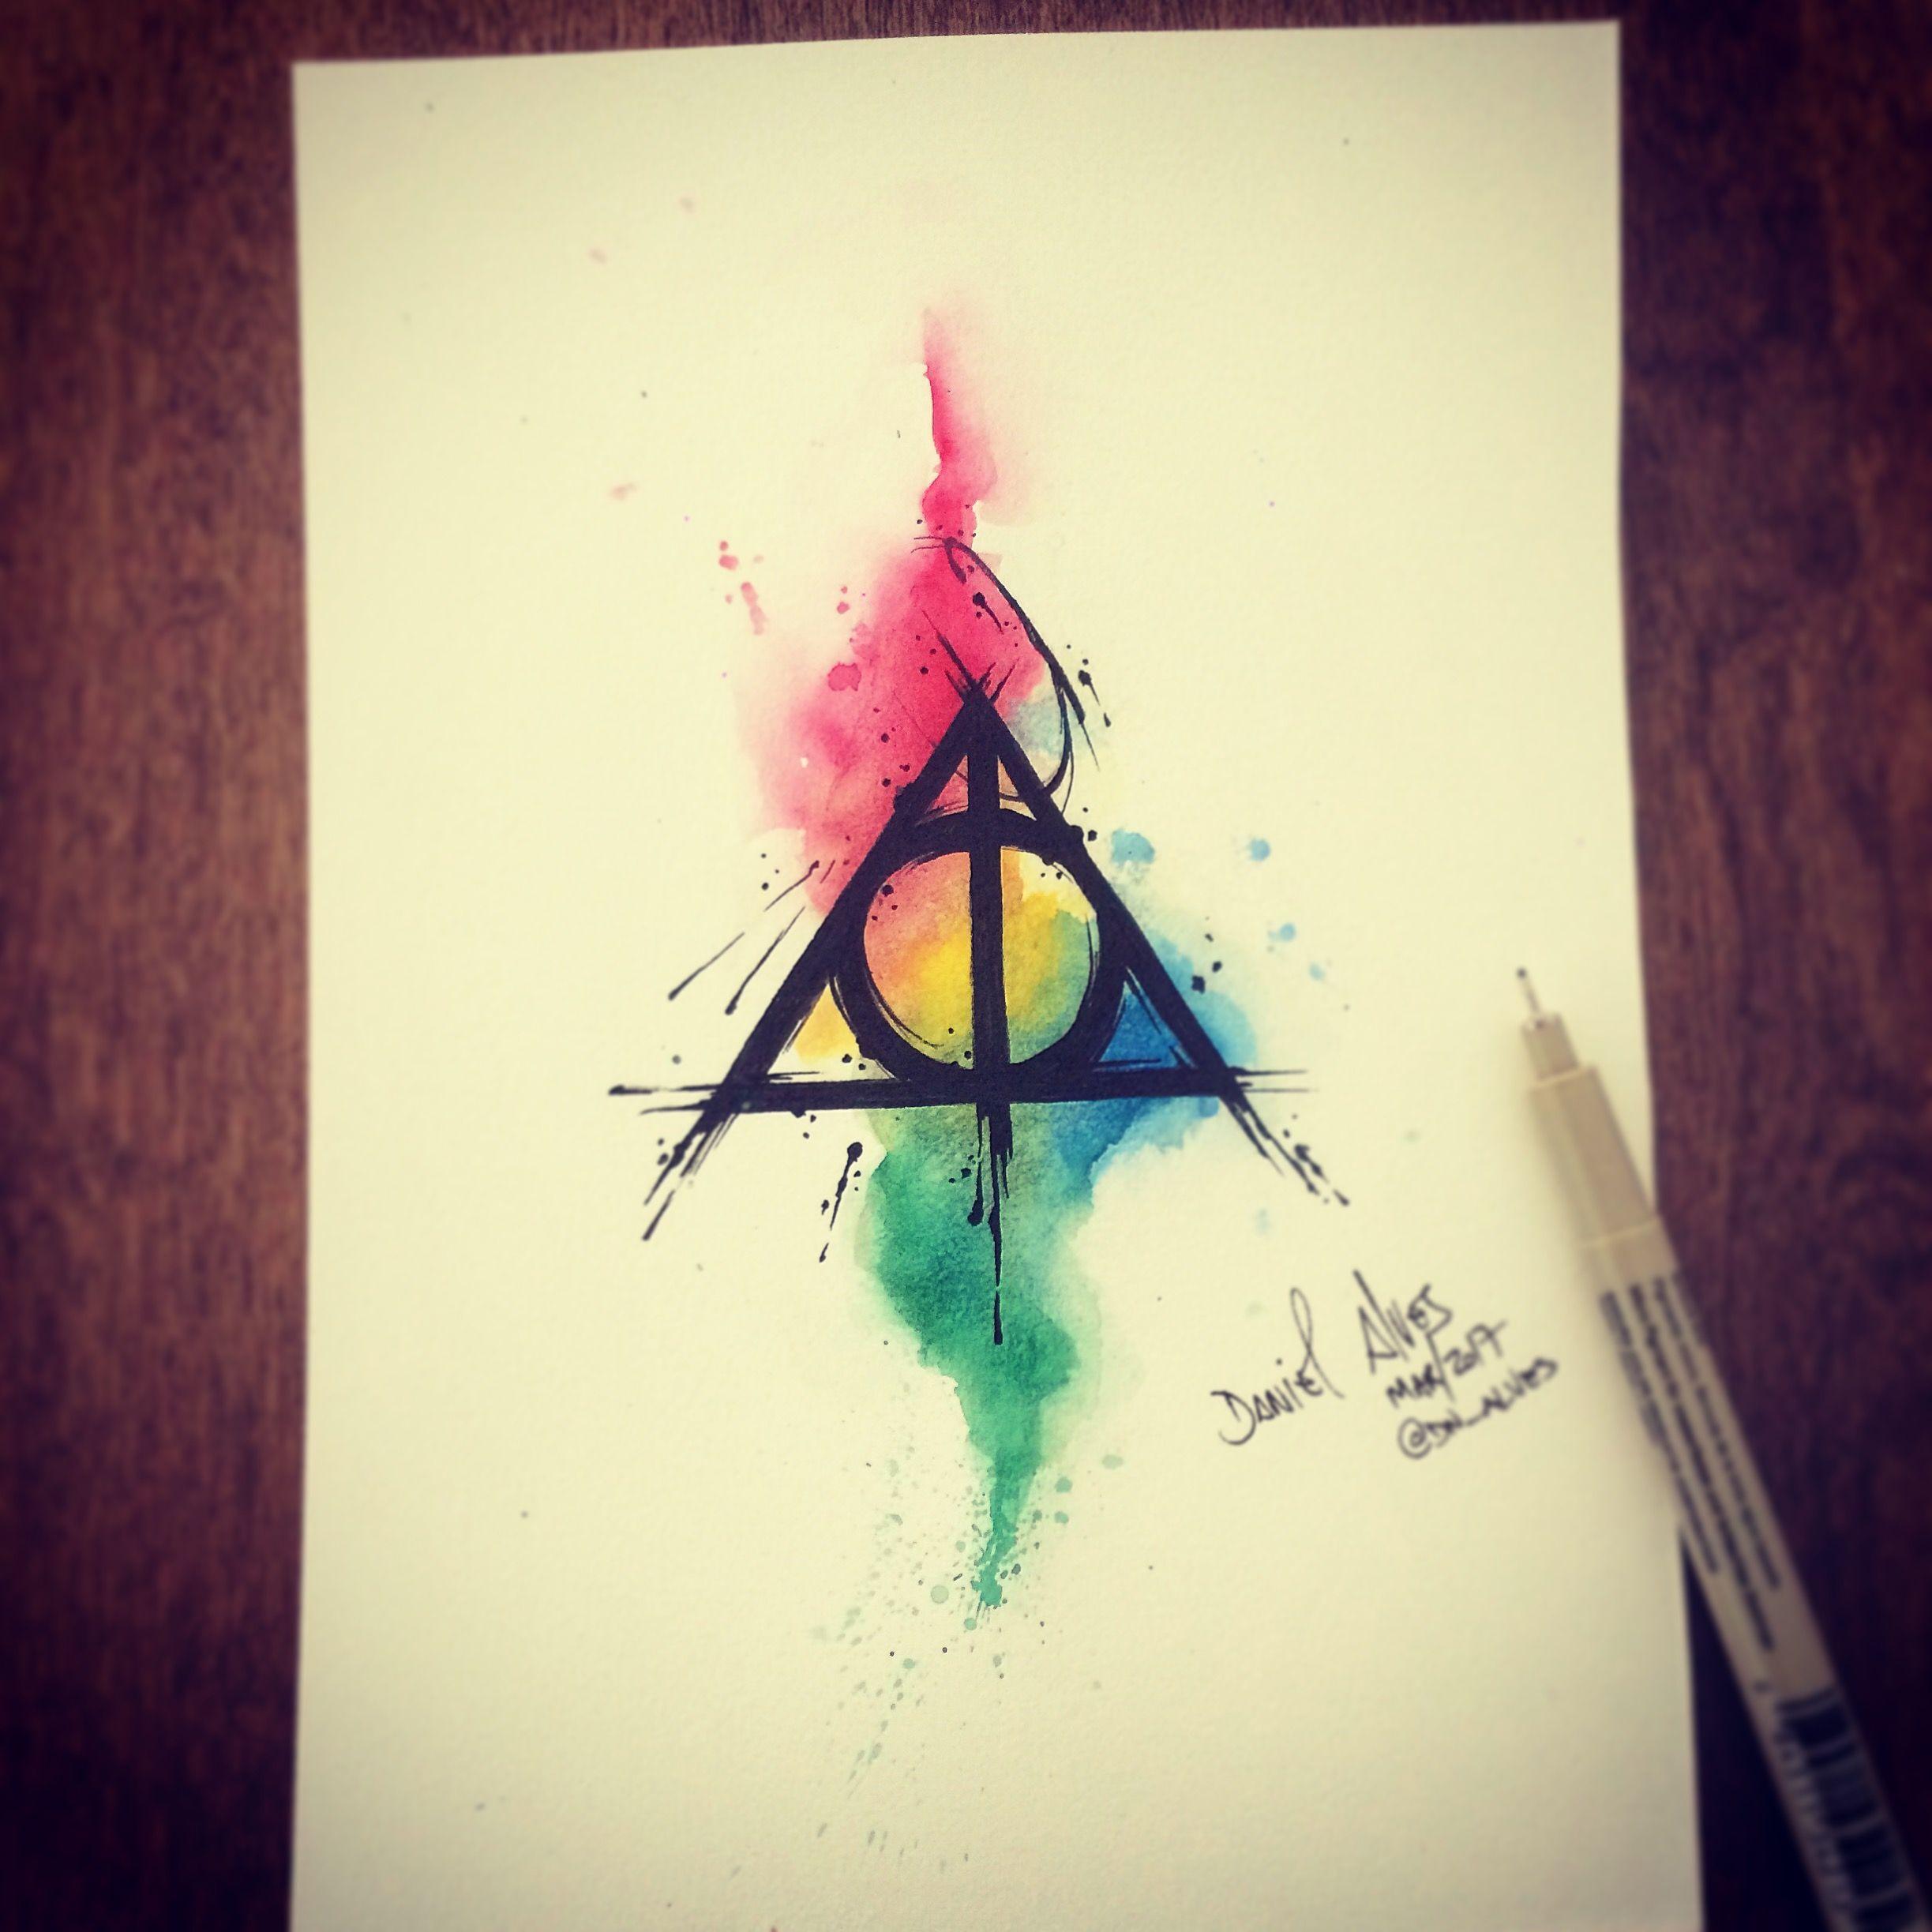 Watercolor Aquarela Art Ilustration By Dn Alves Harry Potter